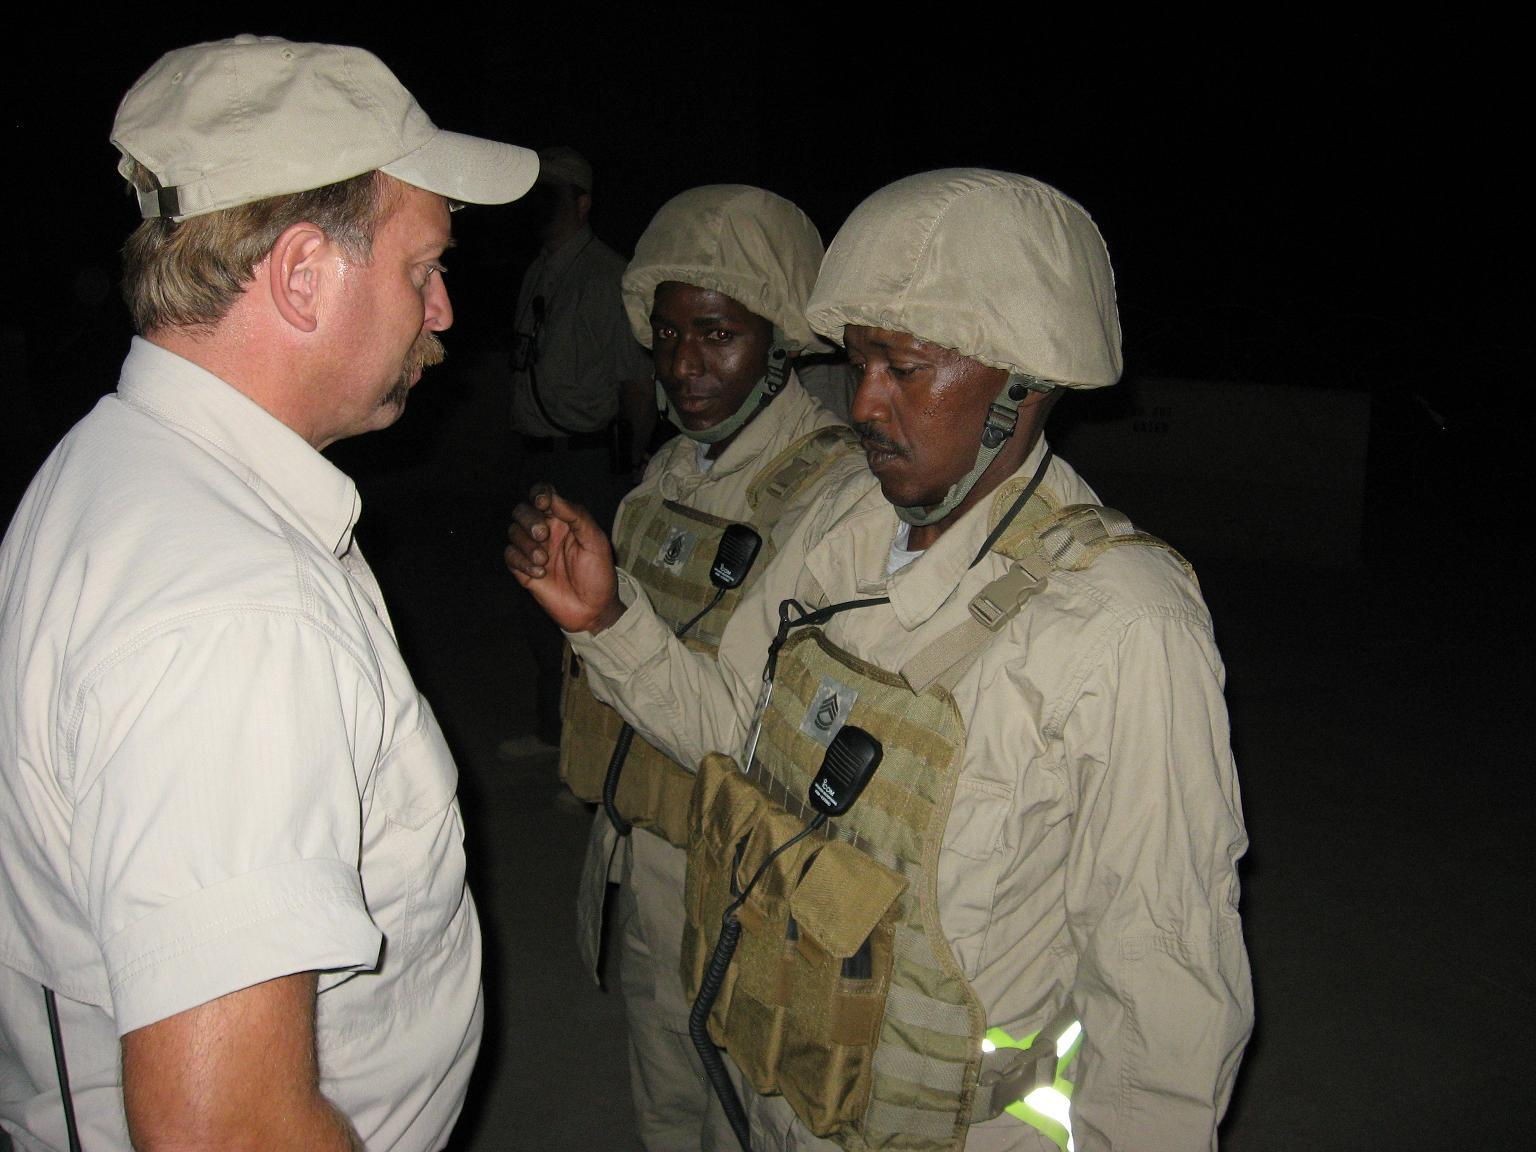 Bob promouted new Ugandan carporal